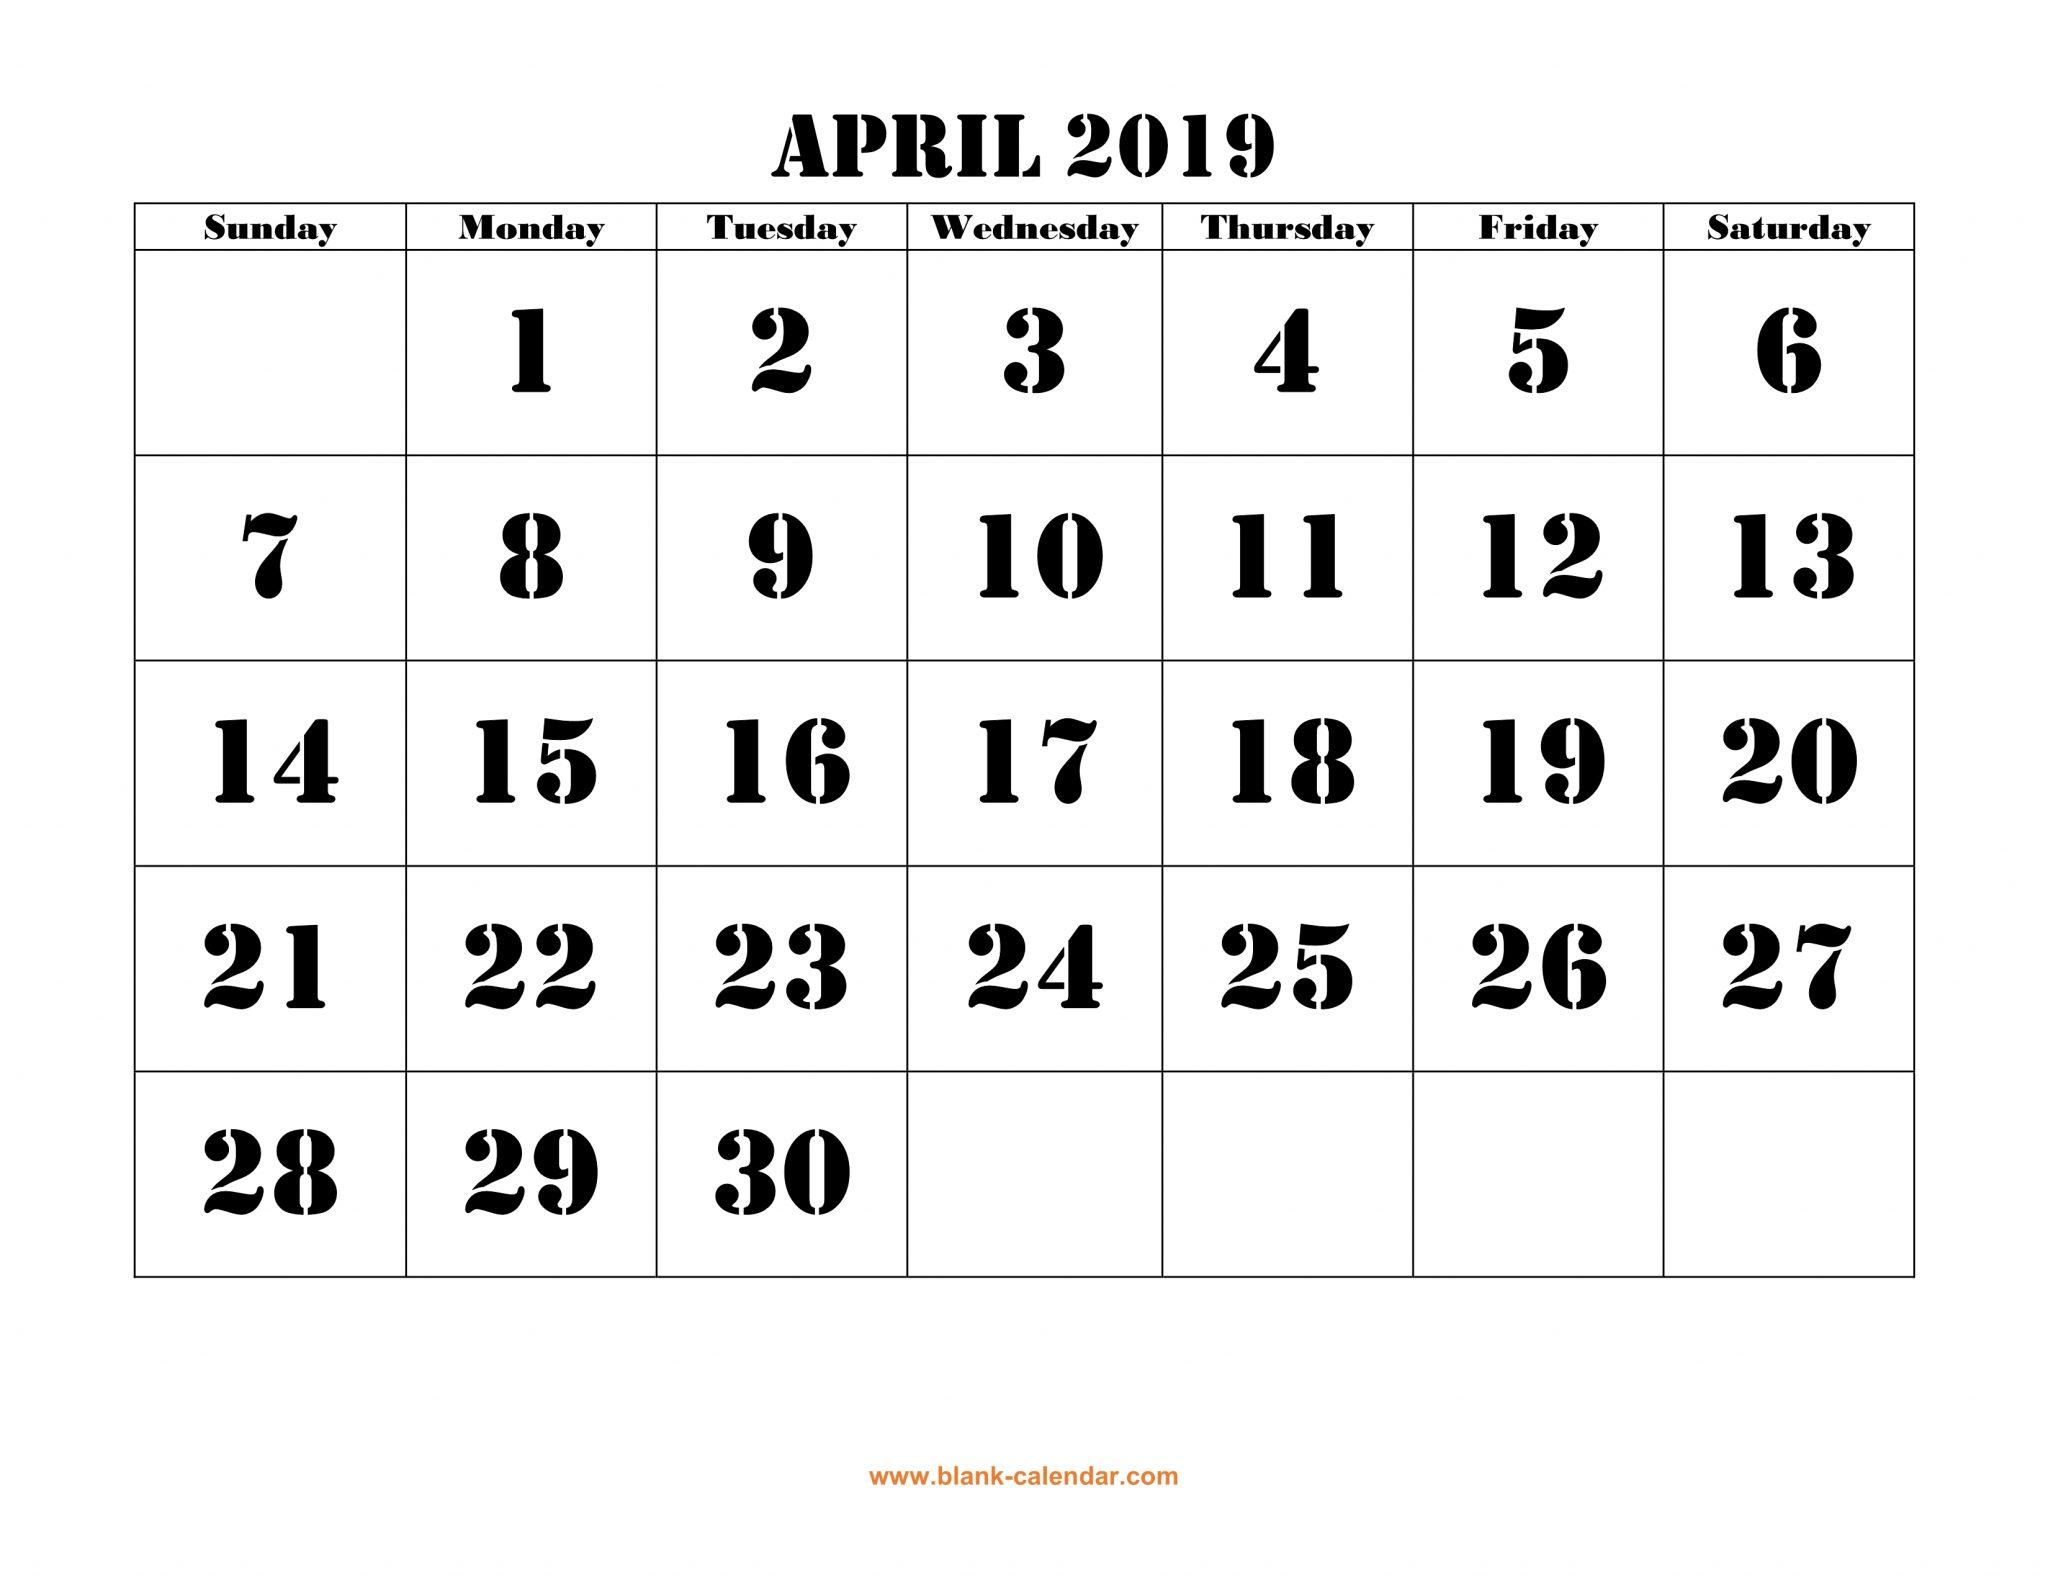 Clipart calendar april 28, Clipart calendar april 28.